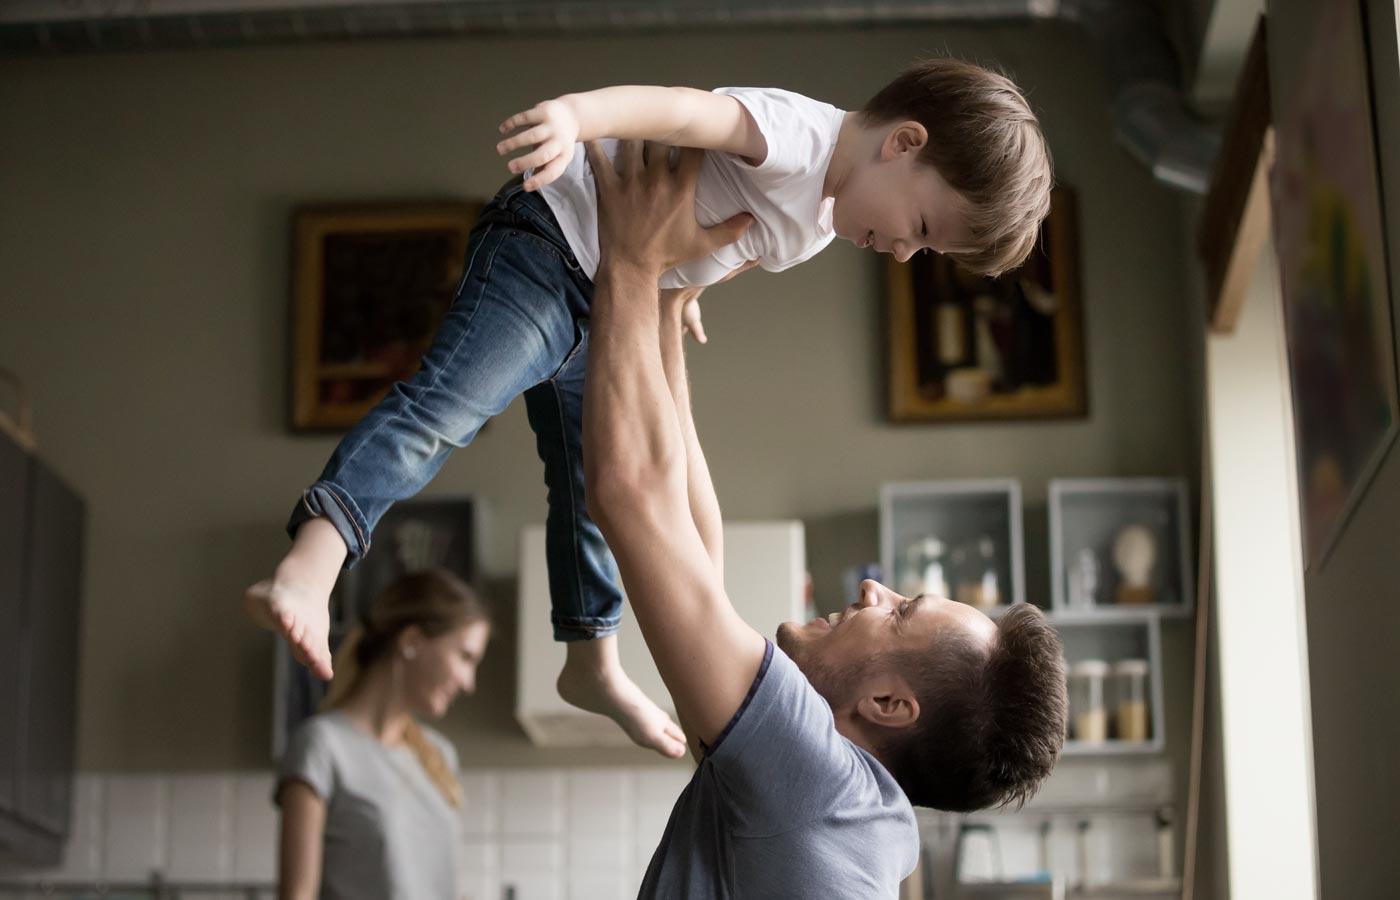 dad holding kid